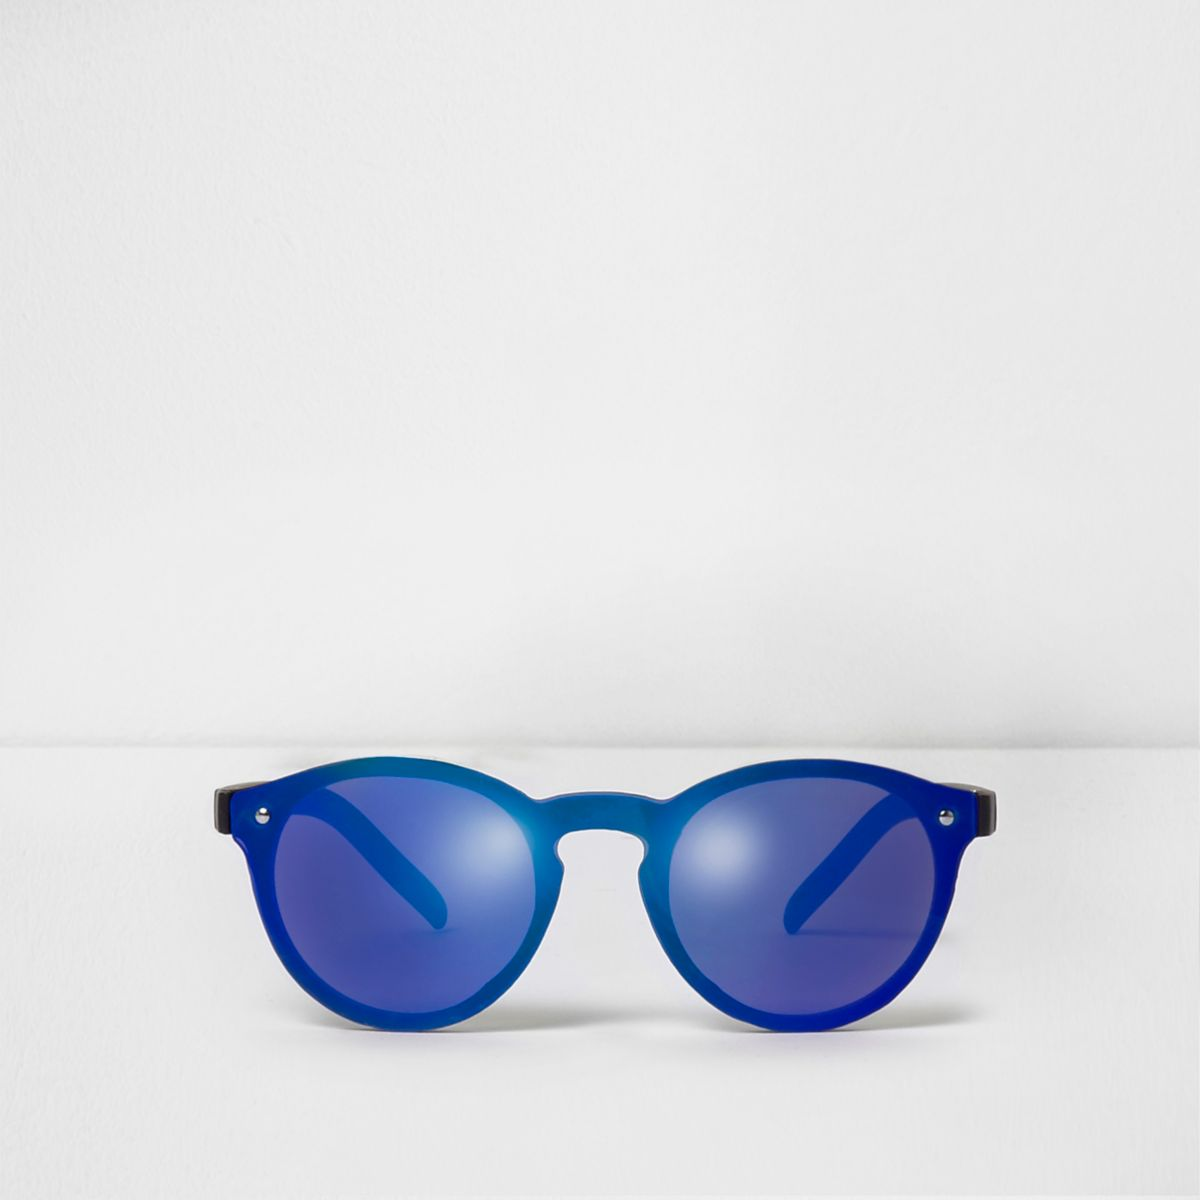 Boys blue laid on lens retro sunglasses